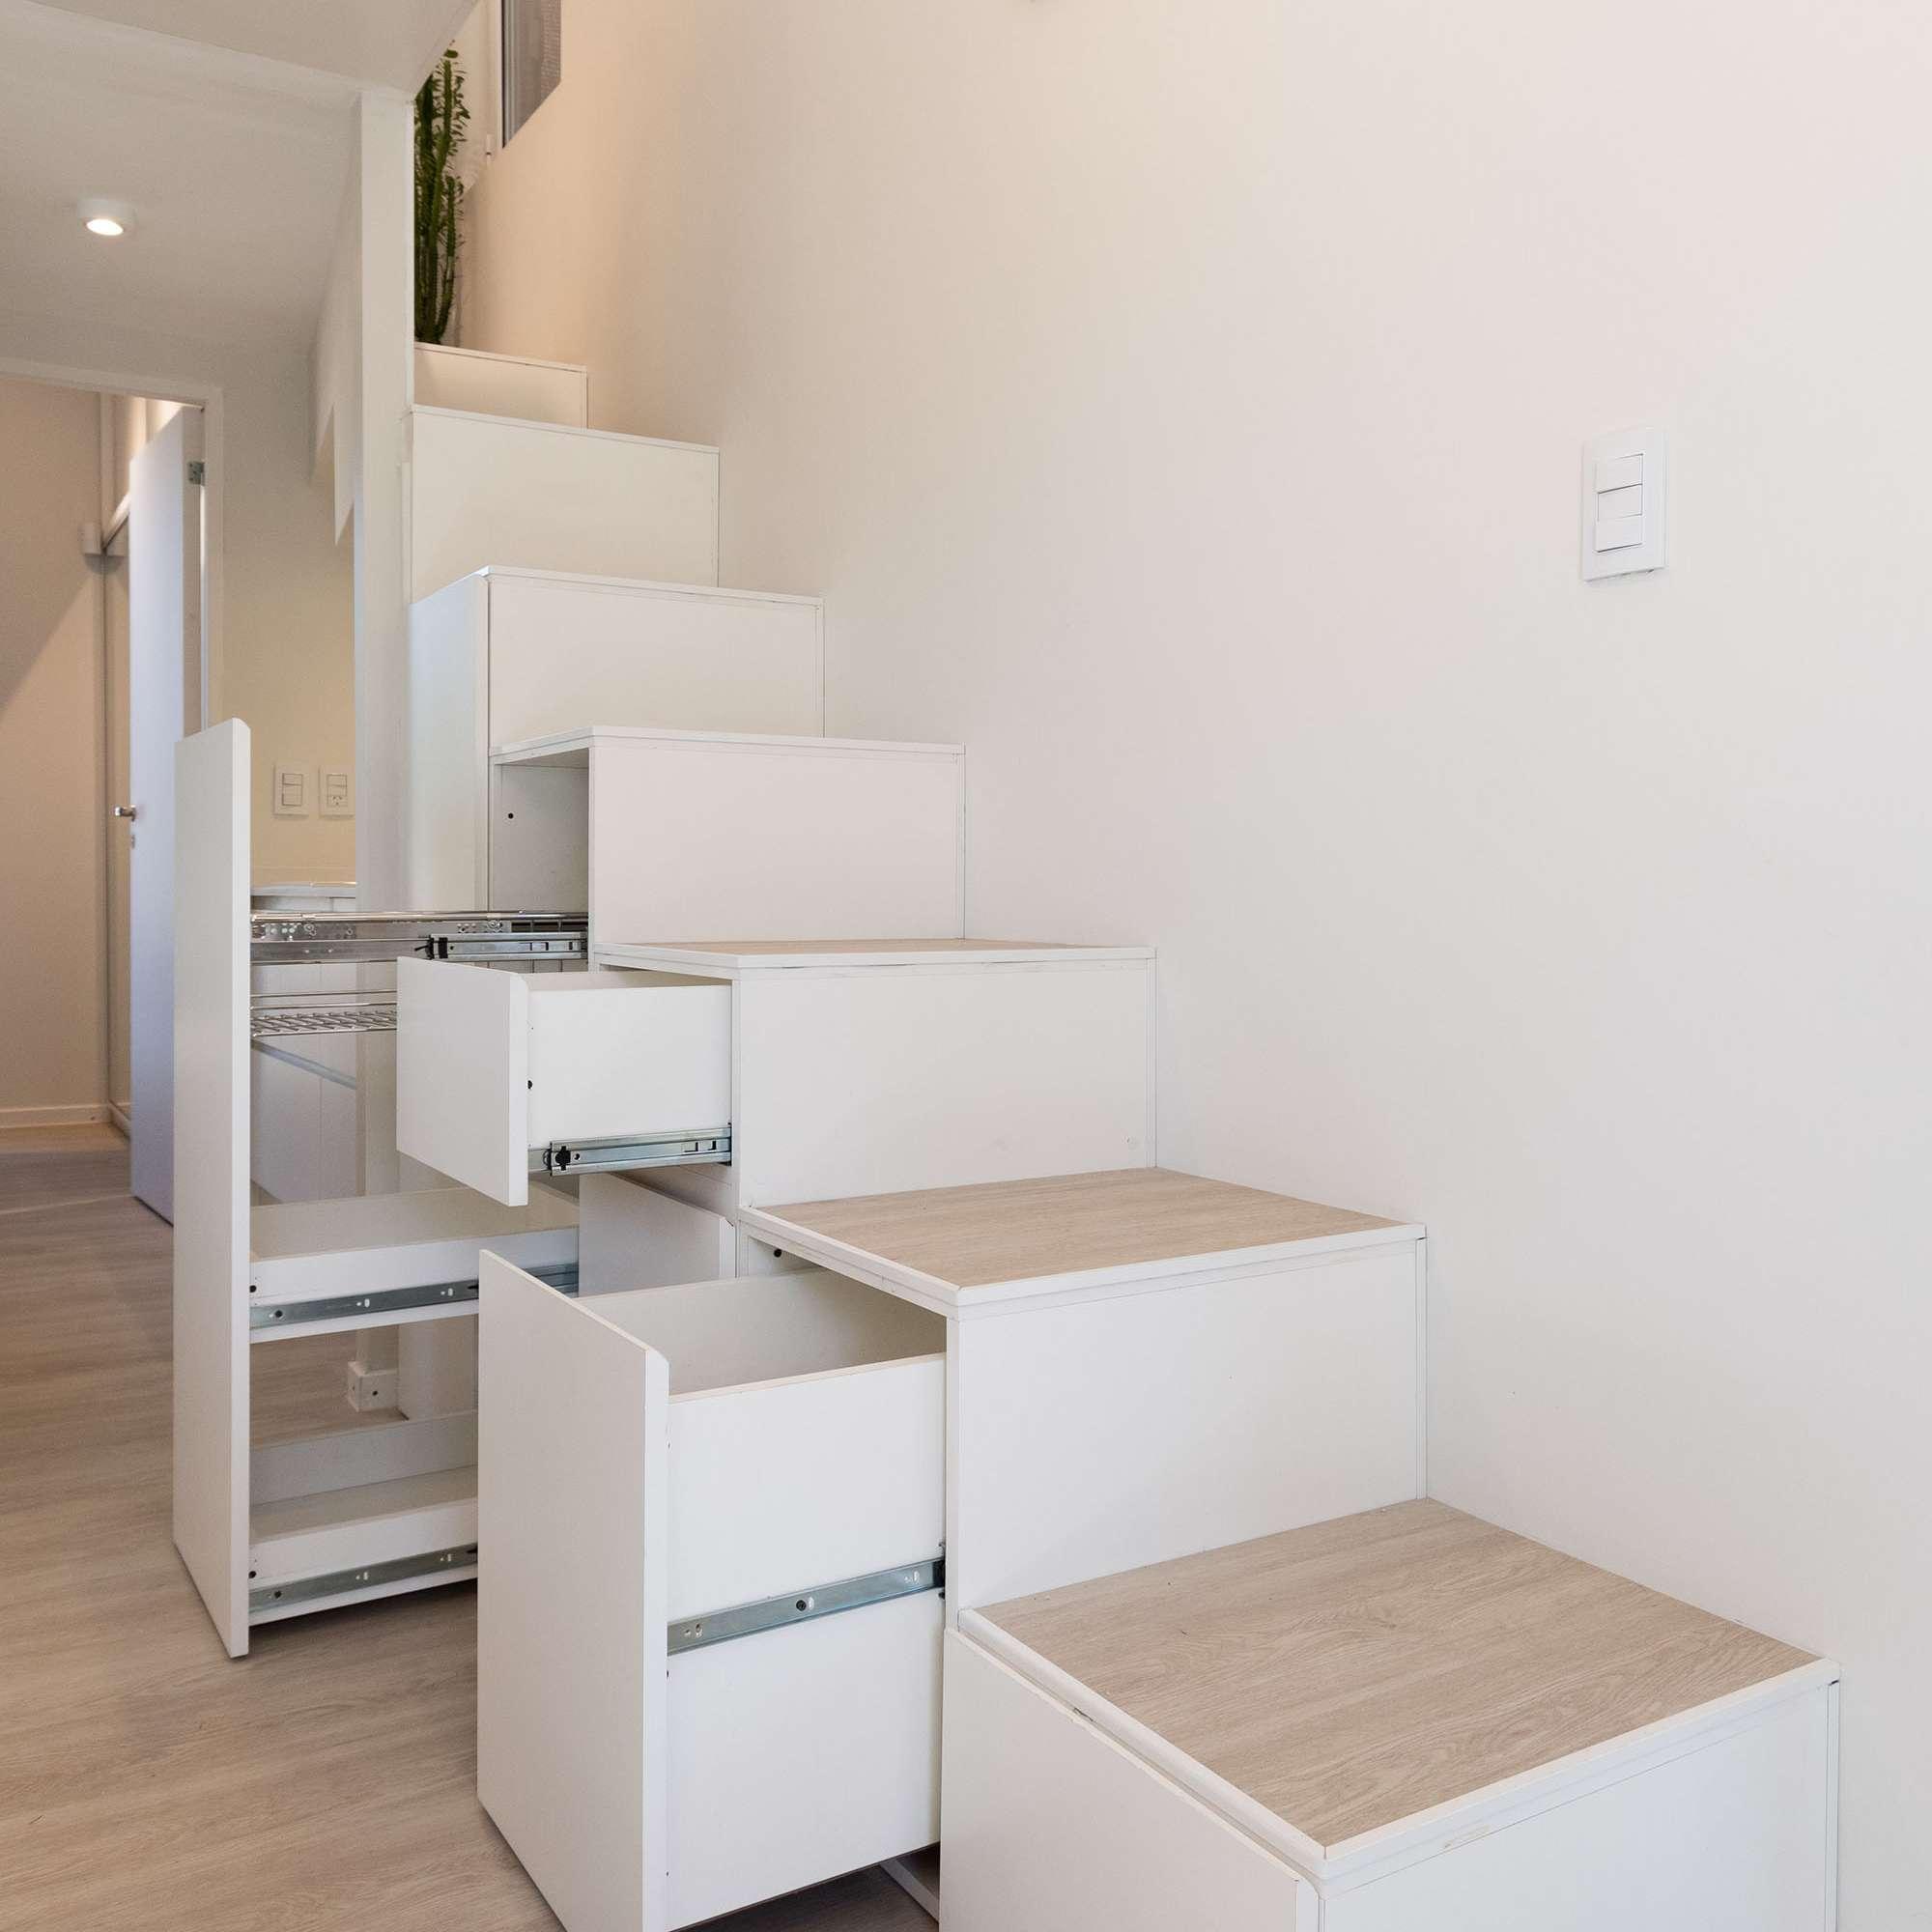 Hüga prefabricated house by Grandio stairs